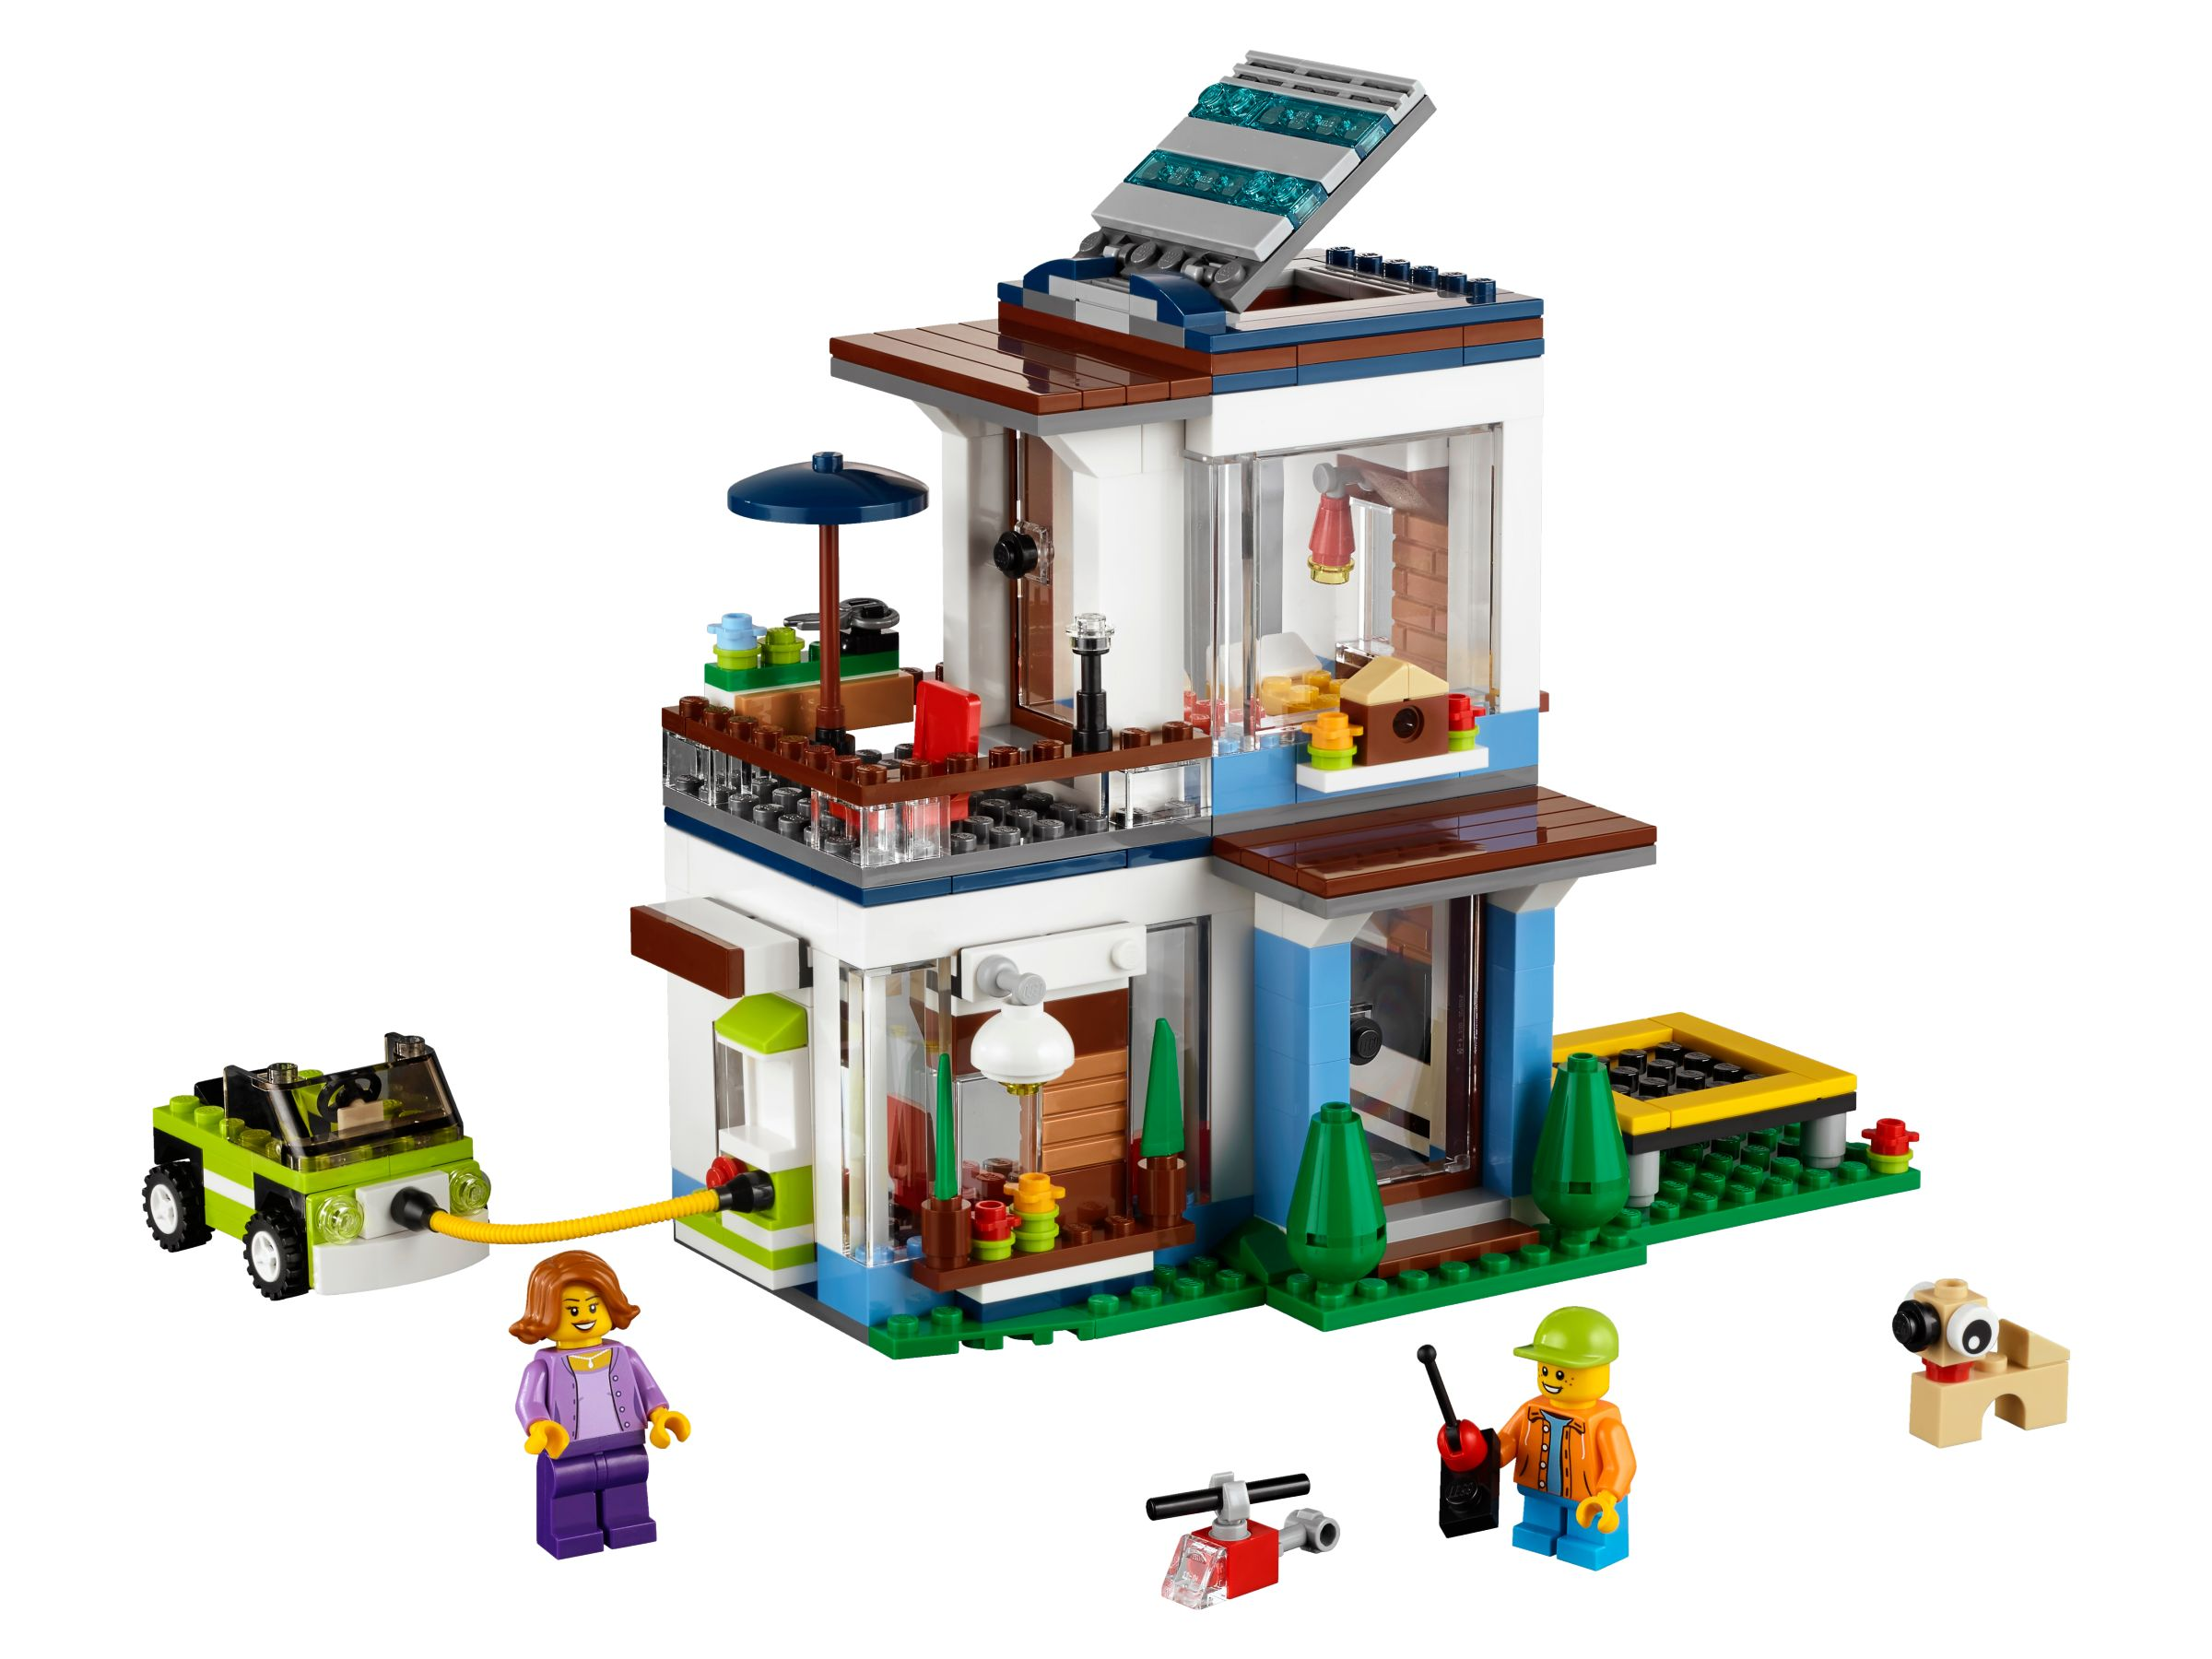 Lego creator 31068 modernes haus lifesteyl for Lego modernes haus